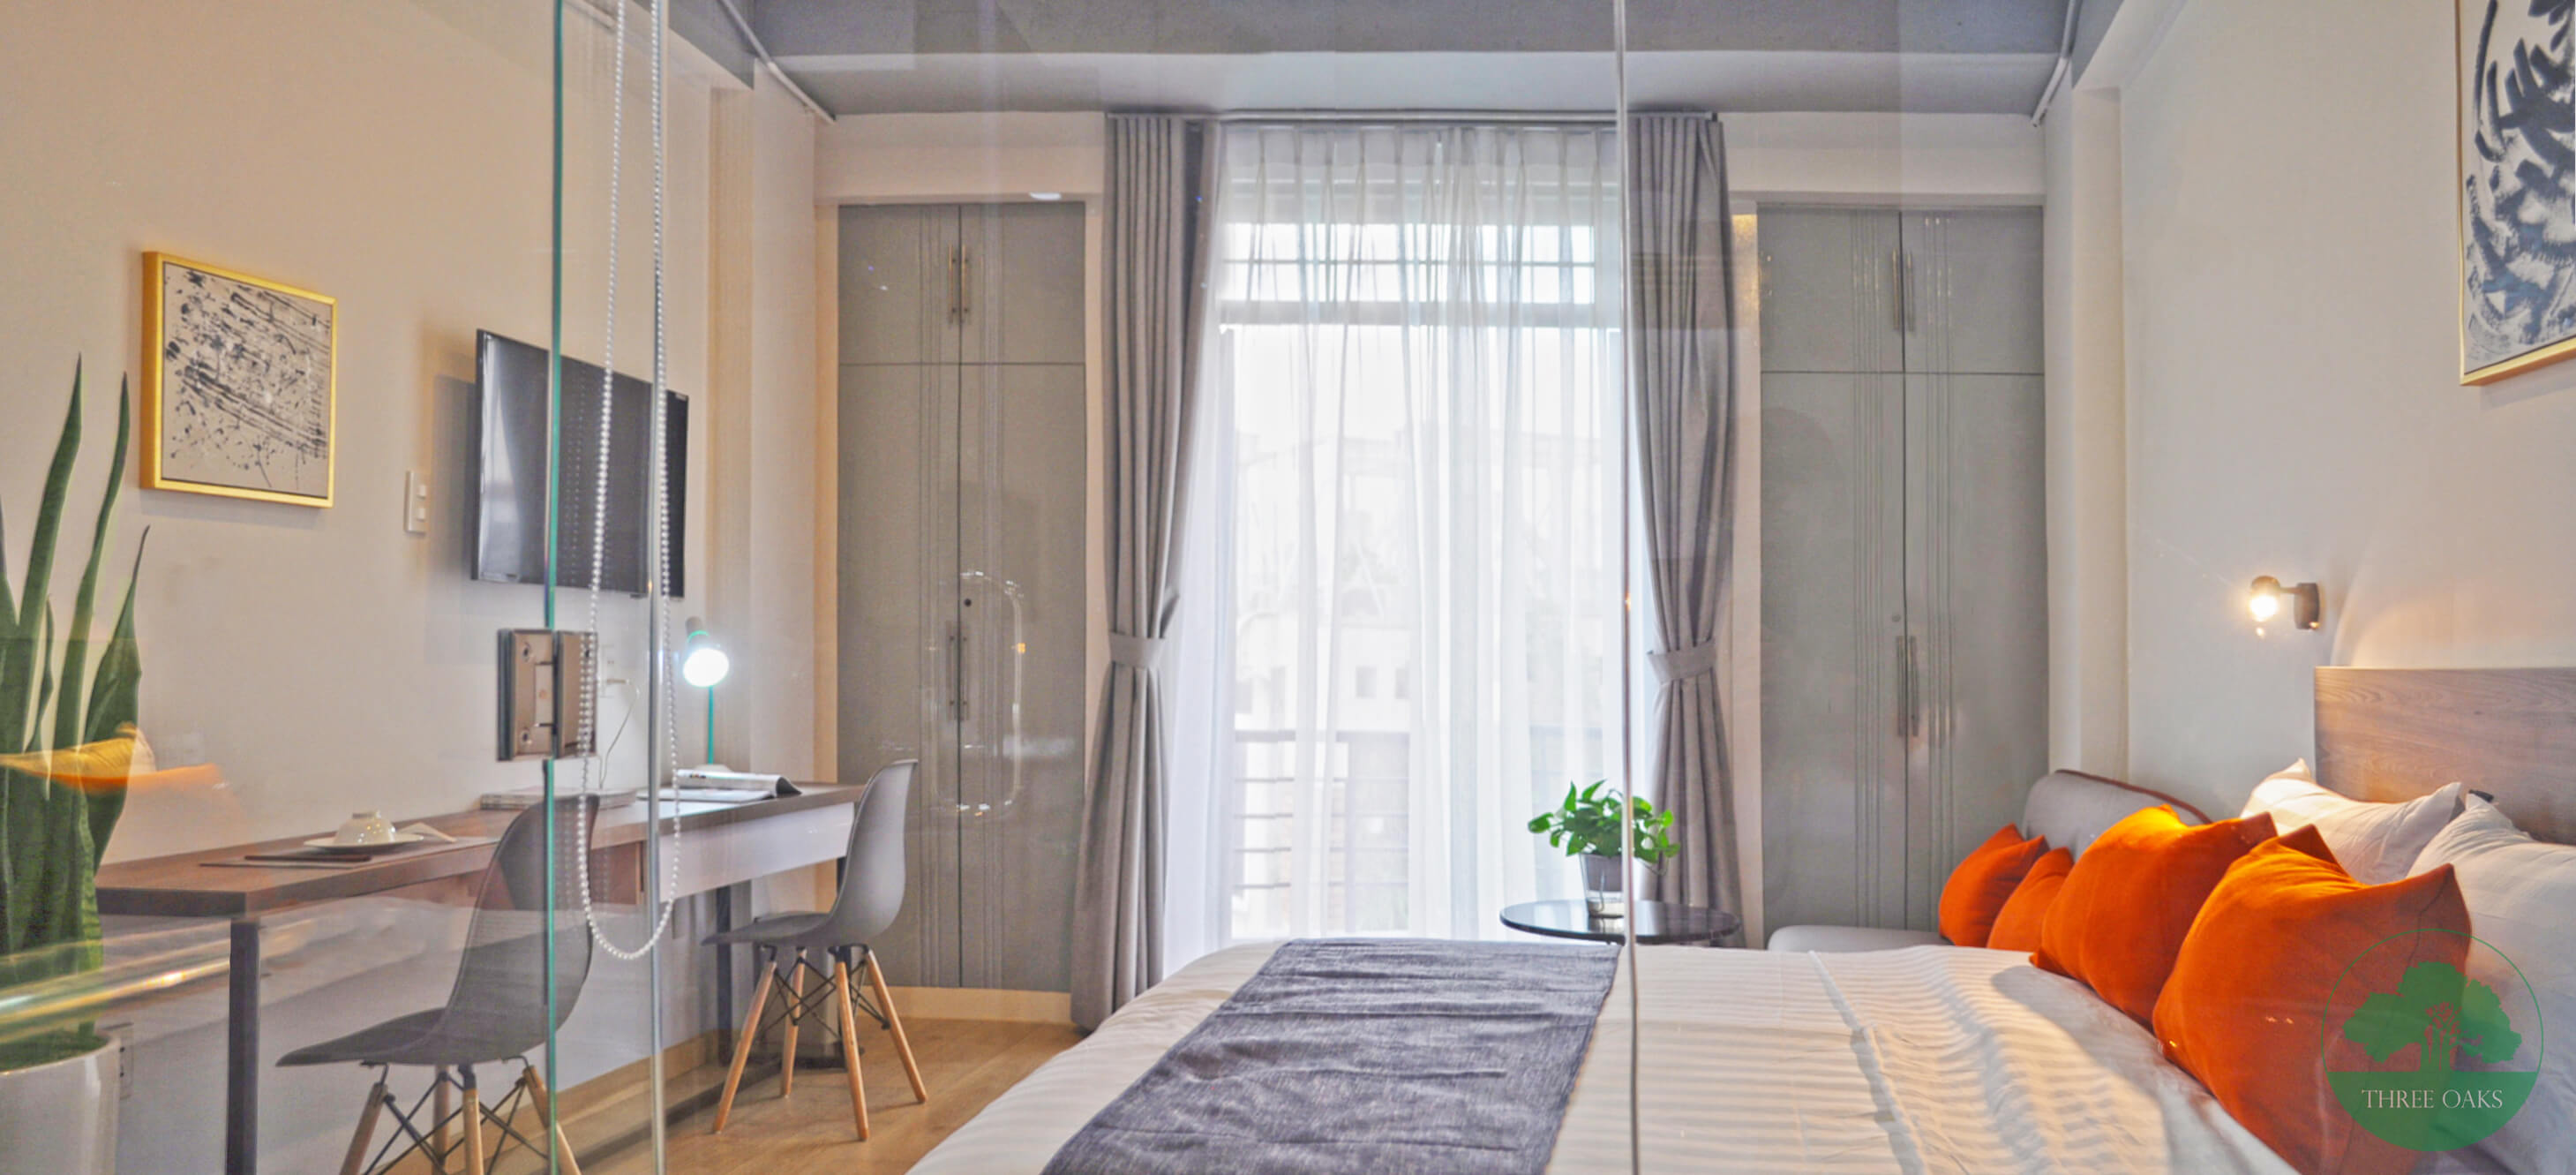 Apartment-for-rent-in-Ho-Chi-Minh-city-Saigon-threeoaks-6-Balcony-7